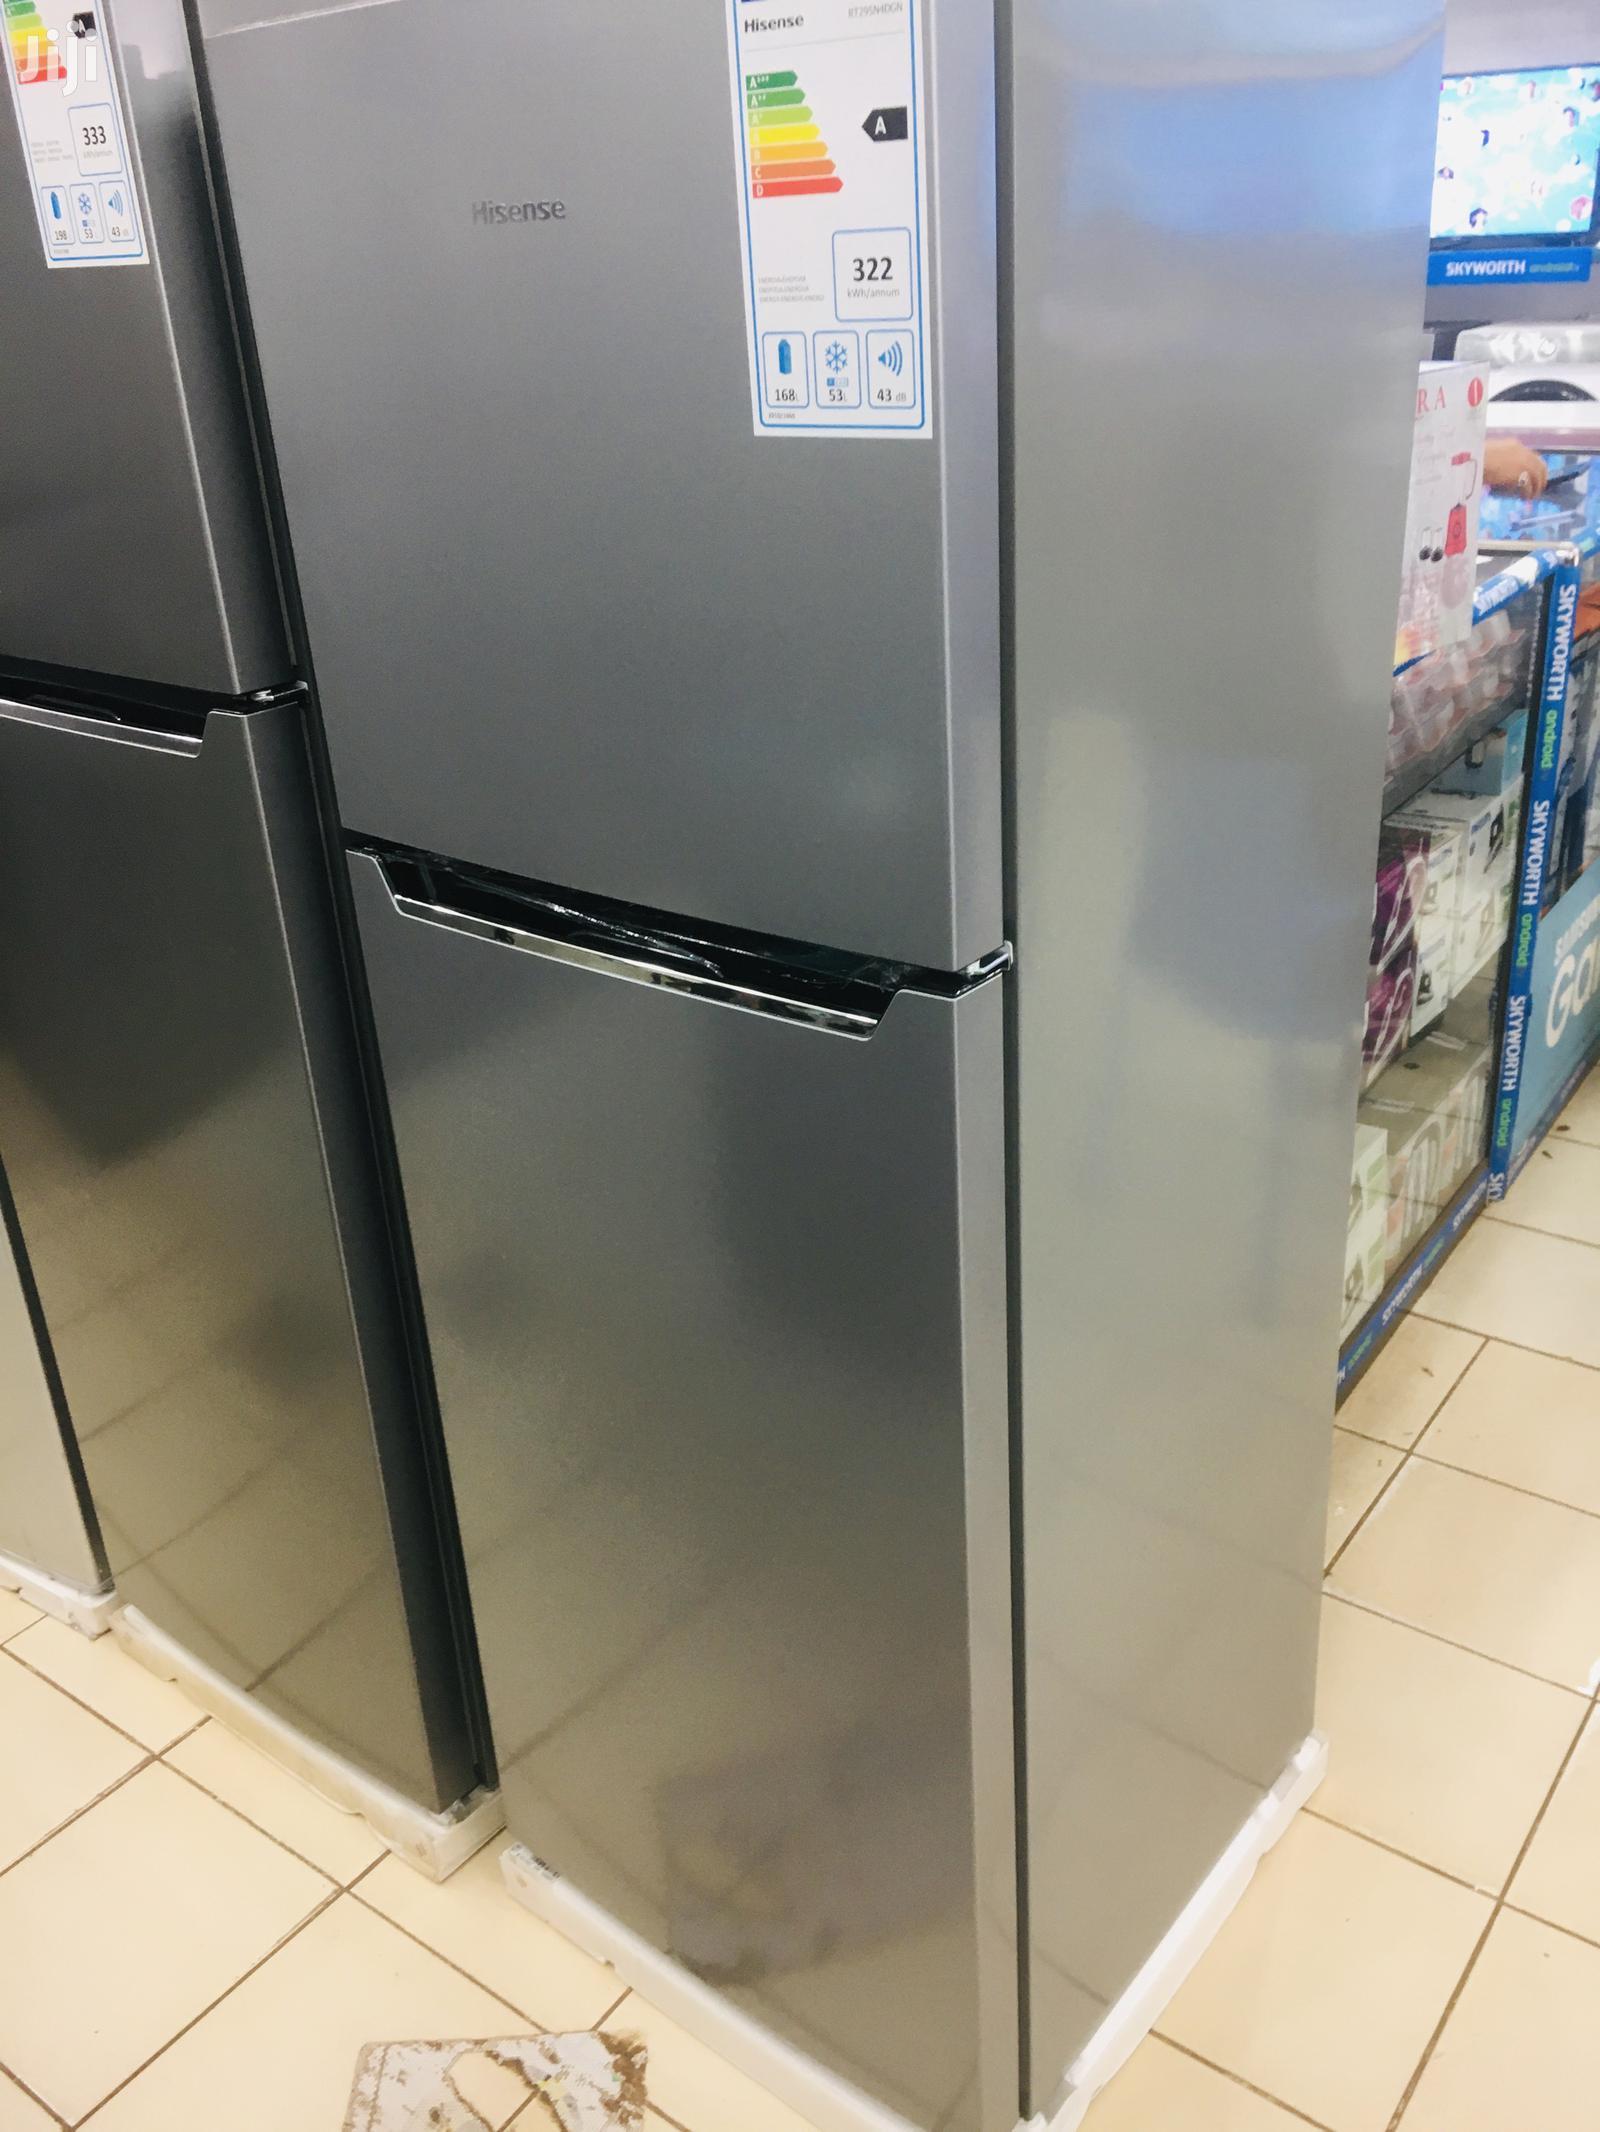 Hisense 295 Litres Double Door Refrigerator Frost Free | Kitchen Appliances for sale in Kampala, Central Region, Uganda